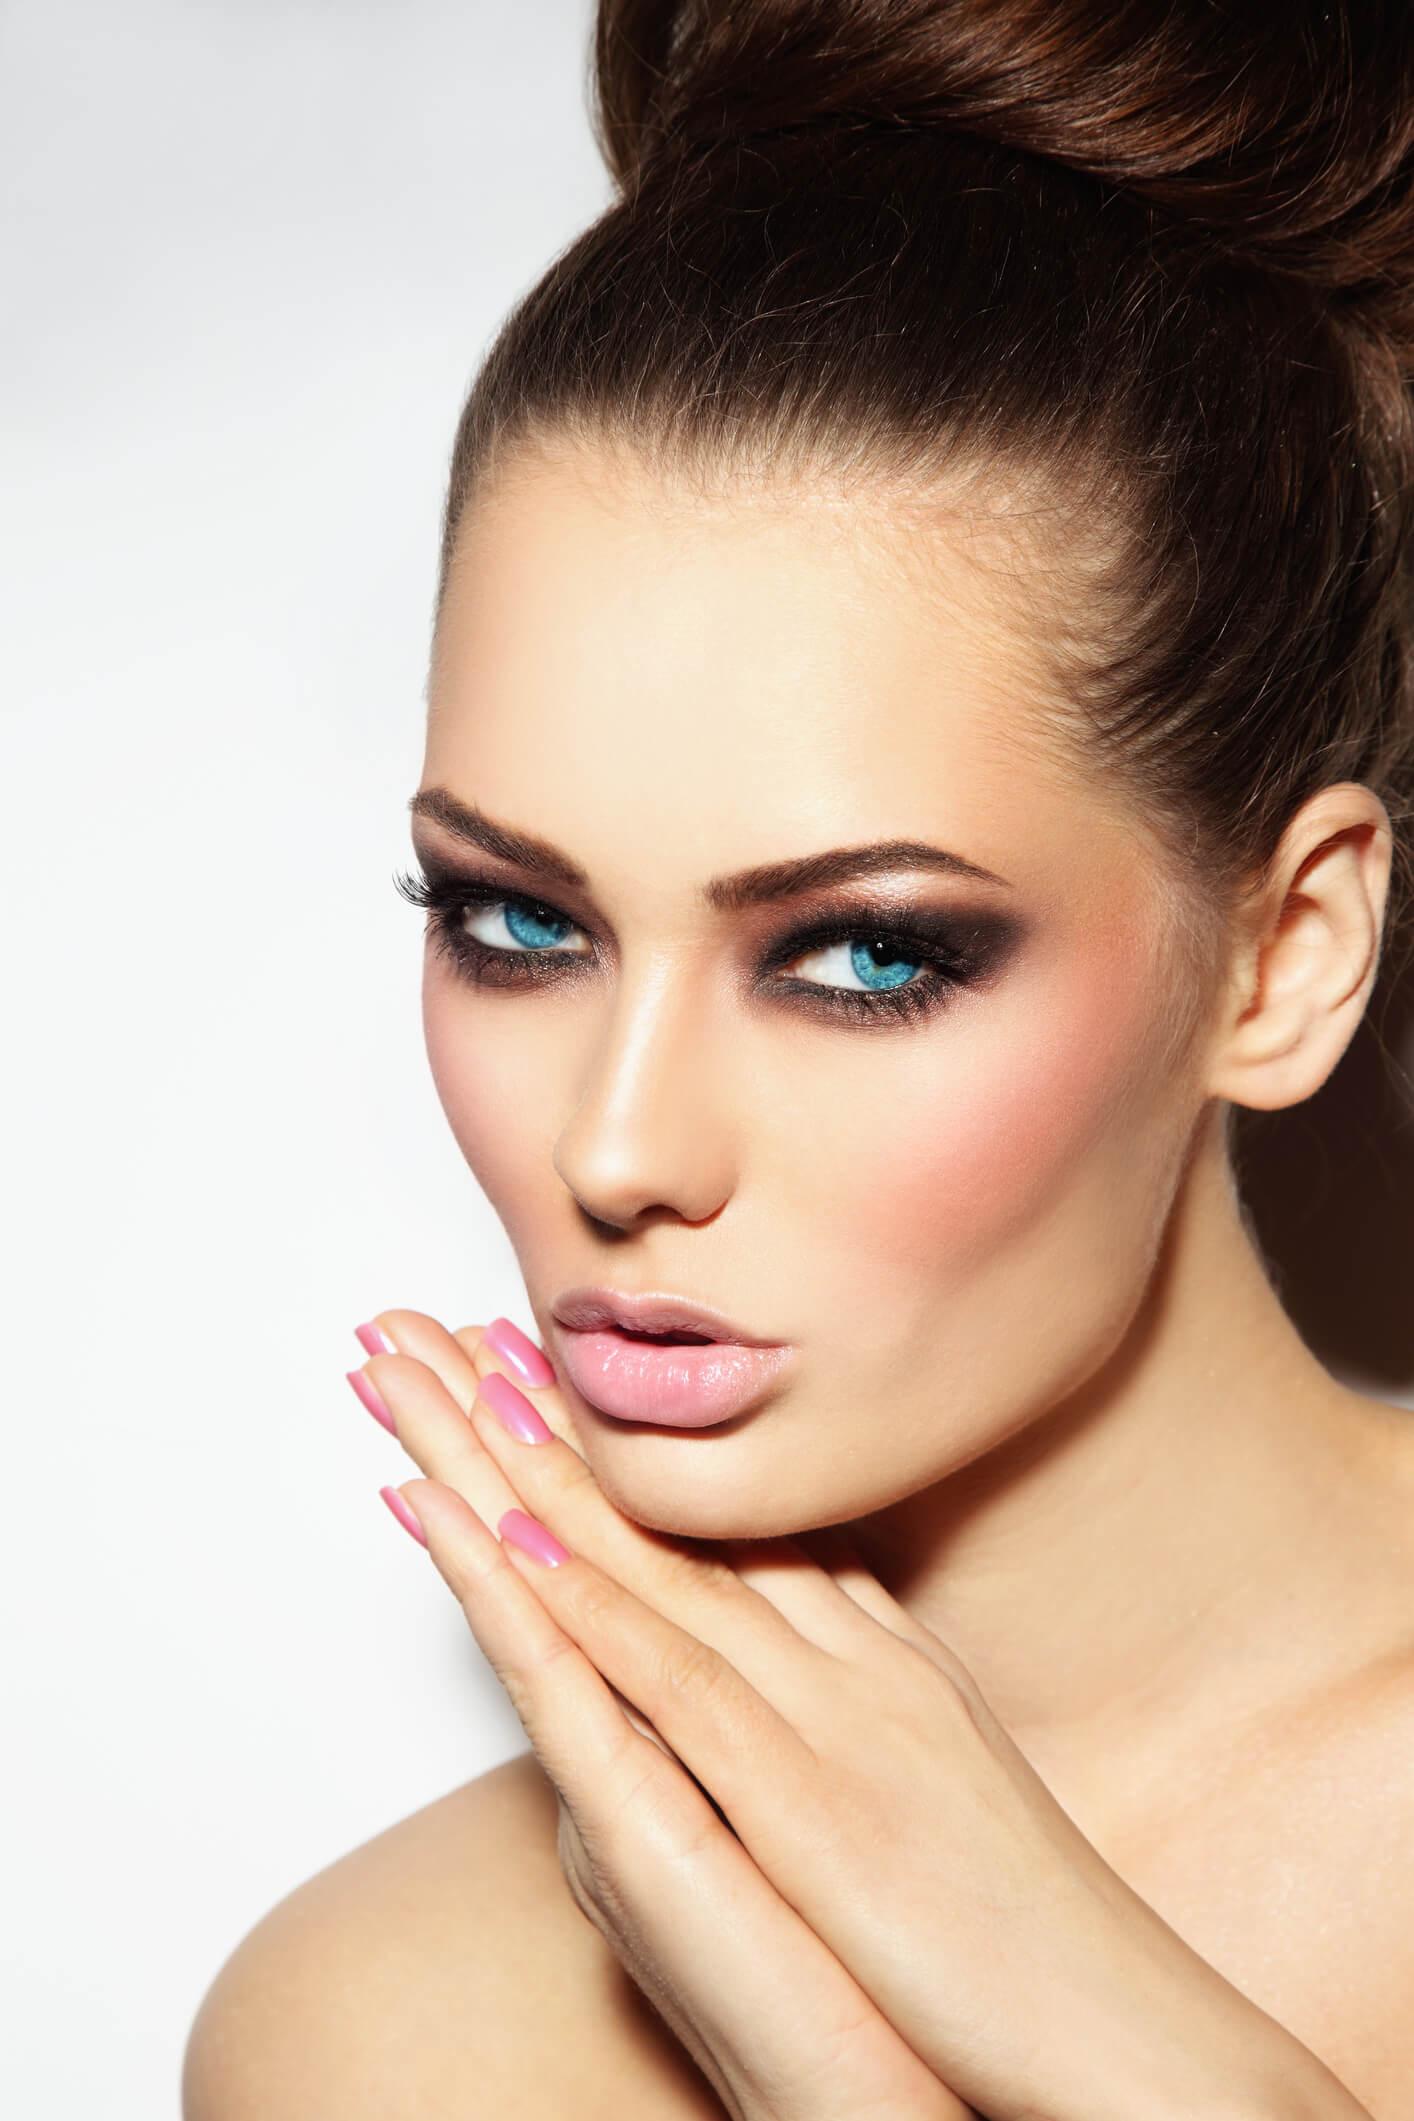 V for Hair & Beauty - Henna Brows - Christchurch